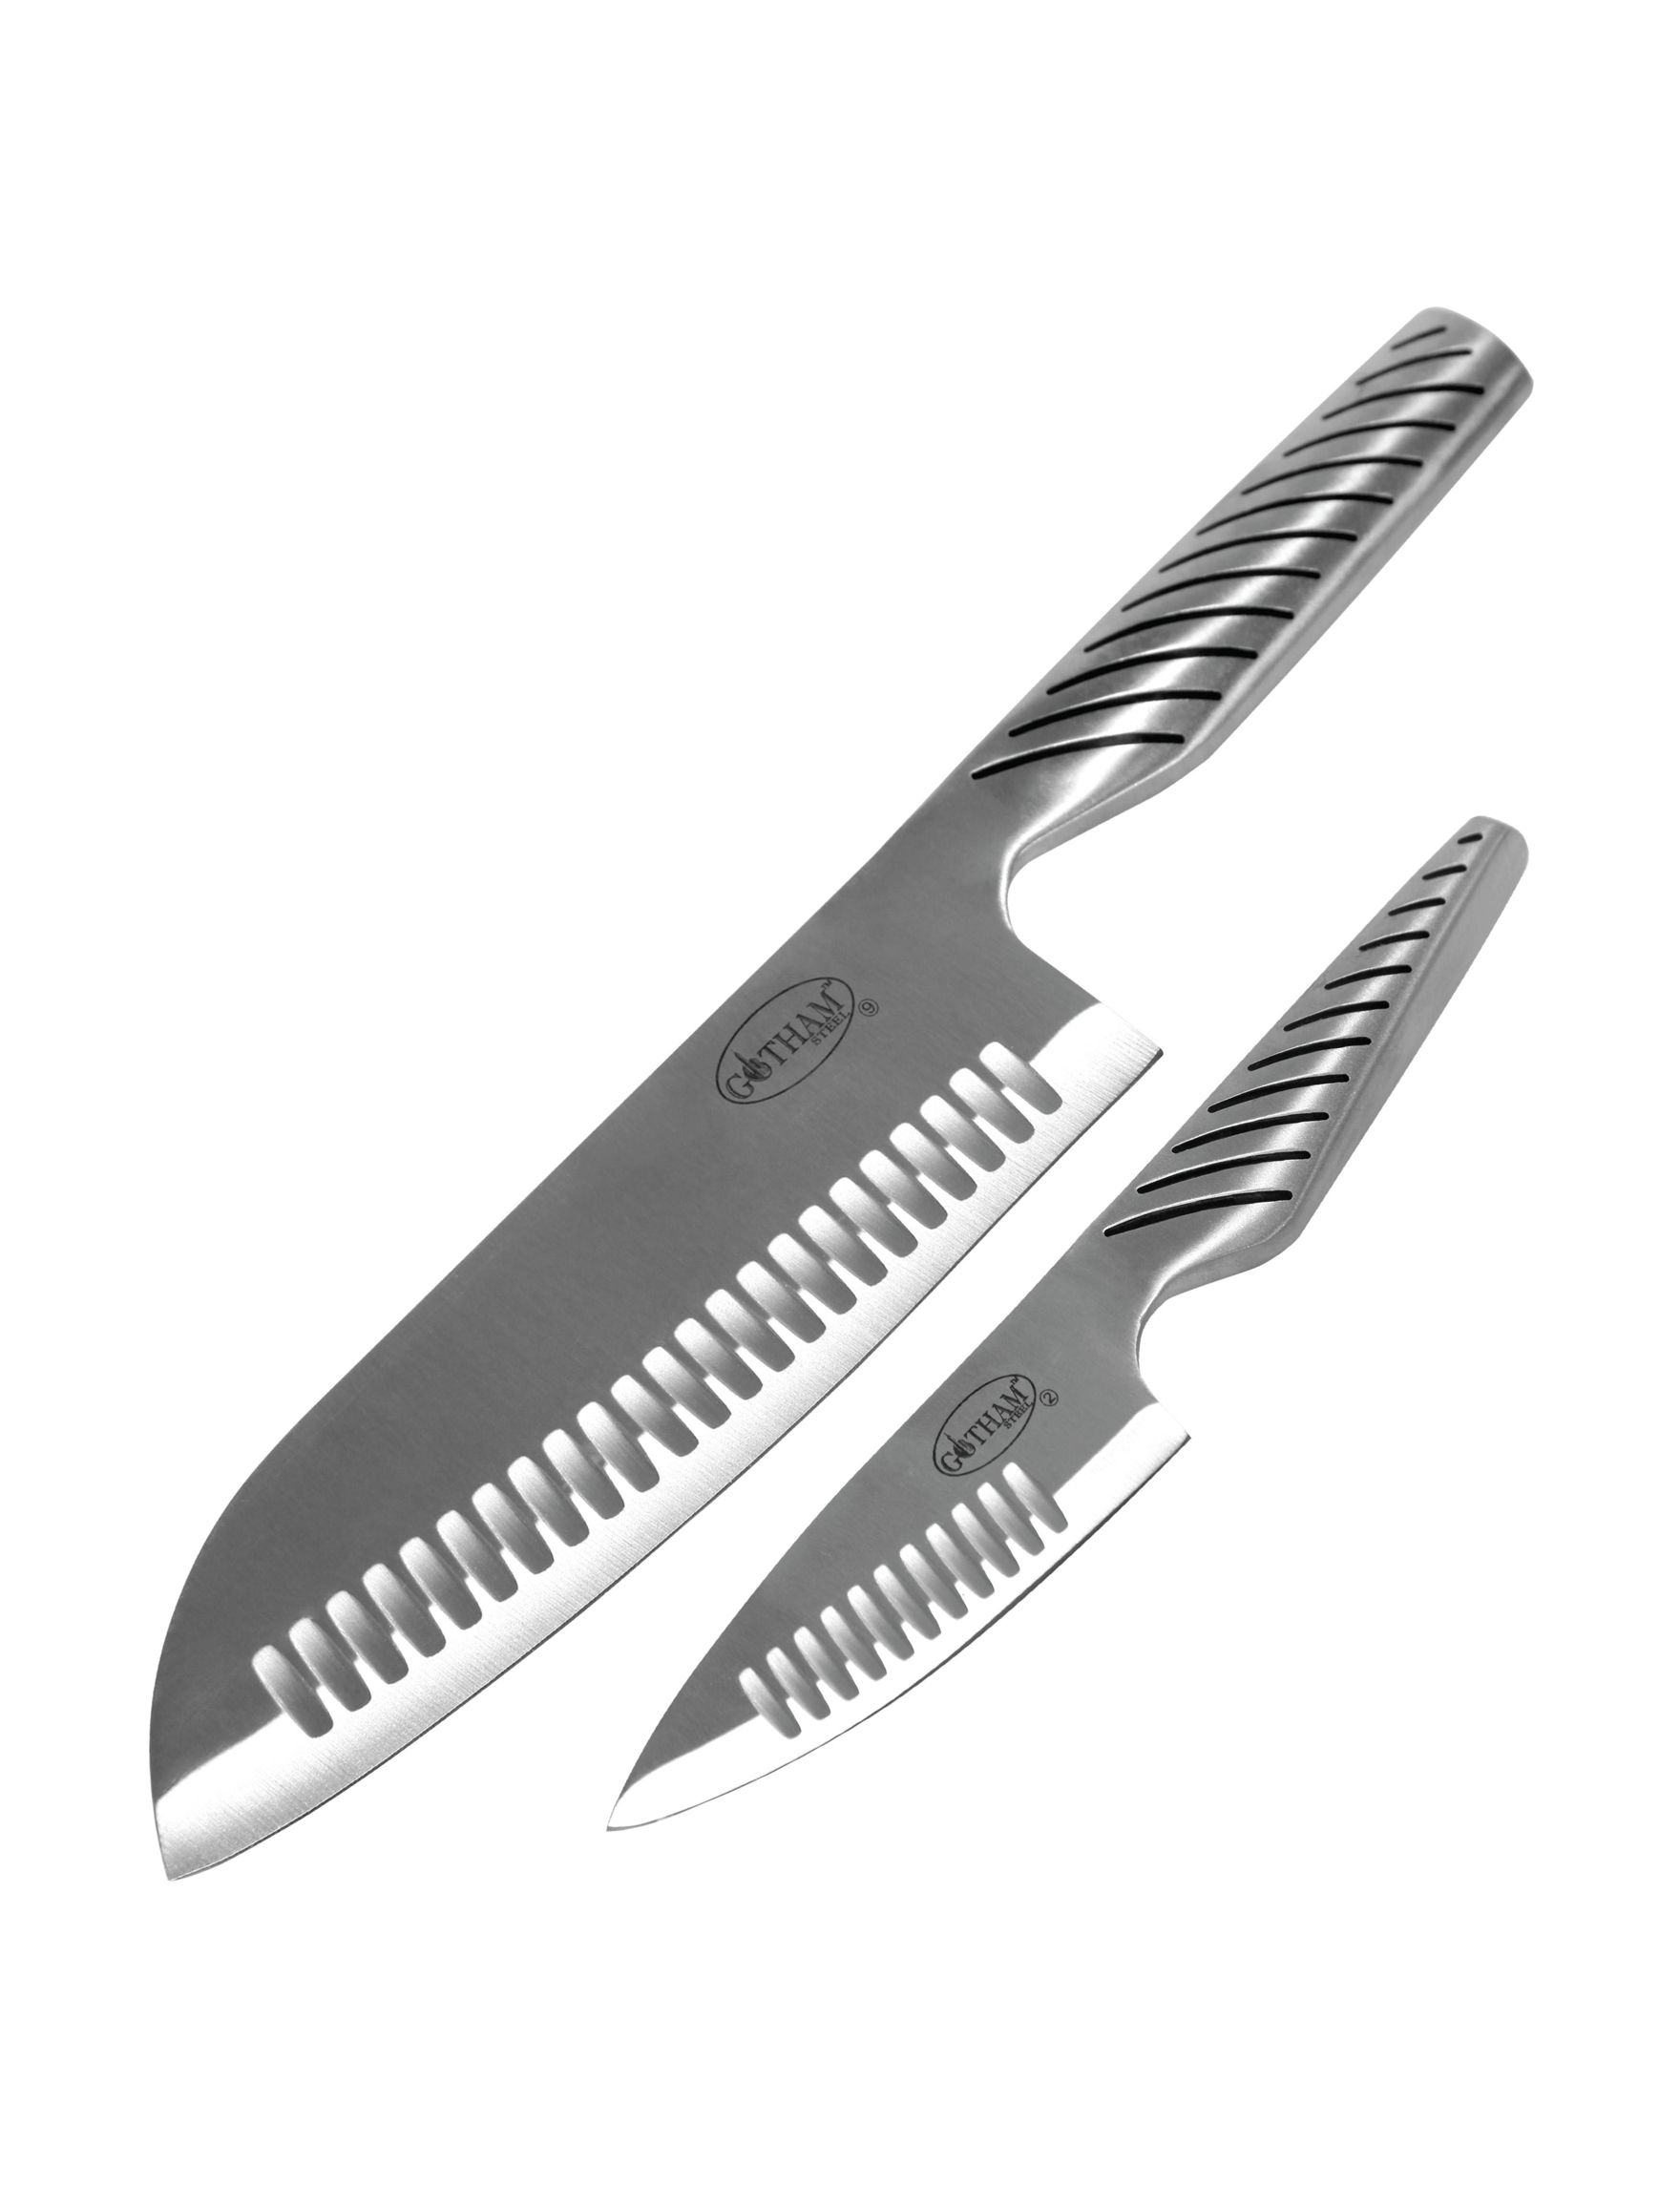 Gotham Steel Silver Knives & Cutlery